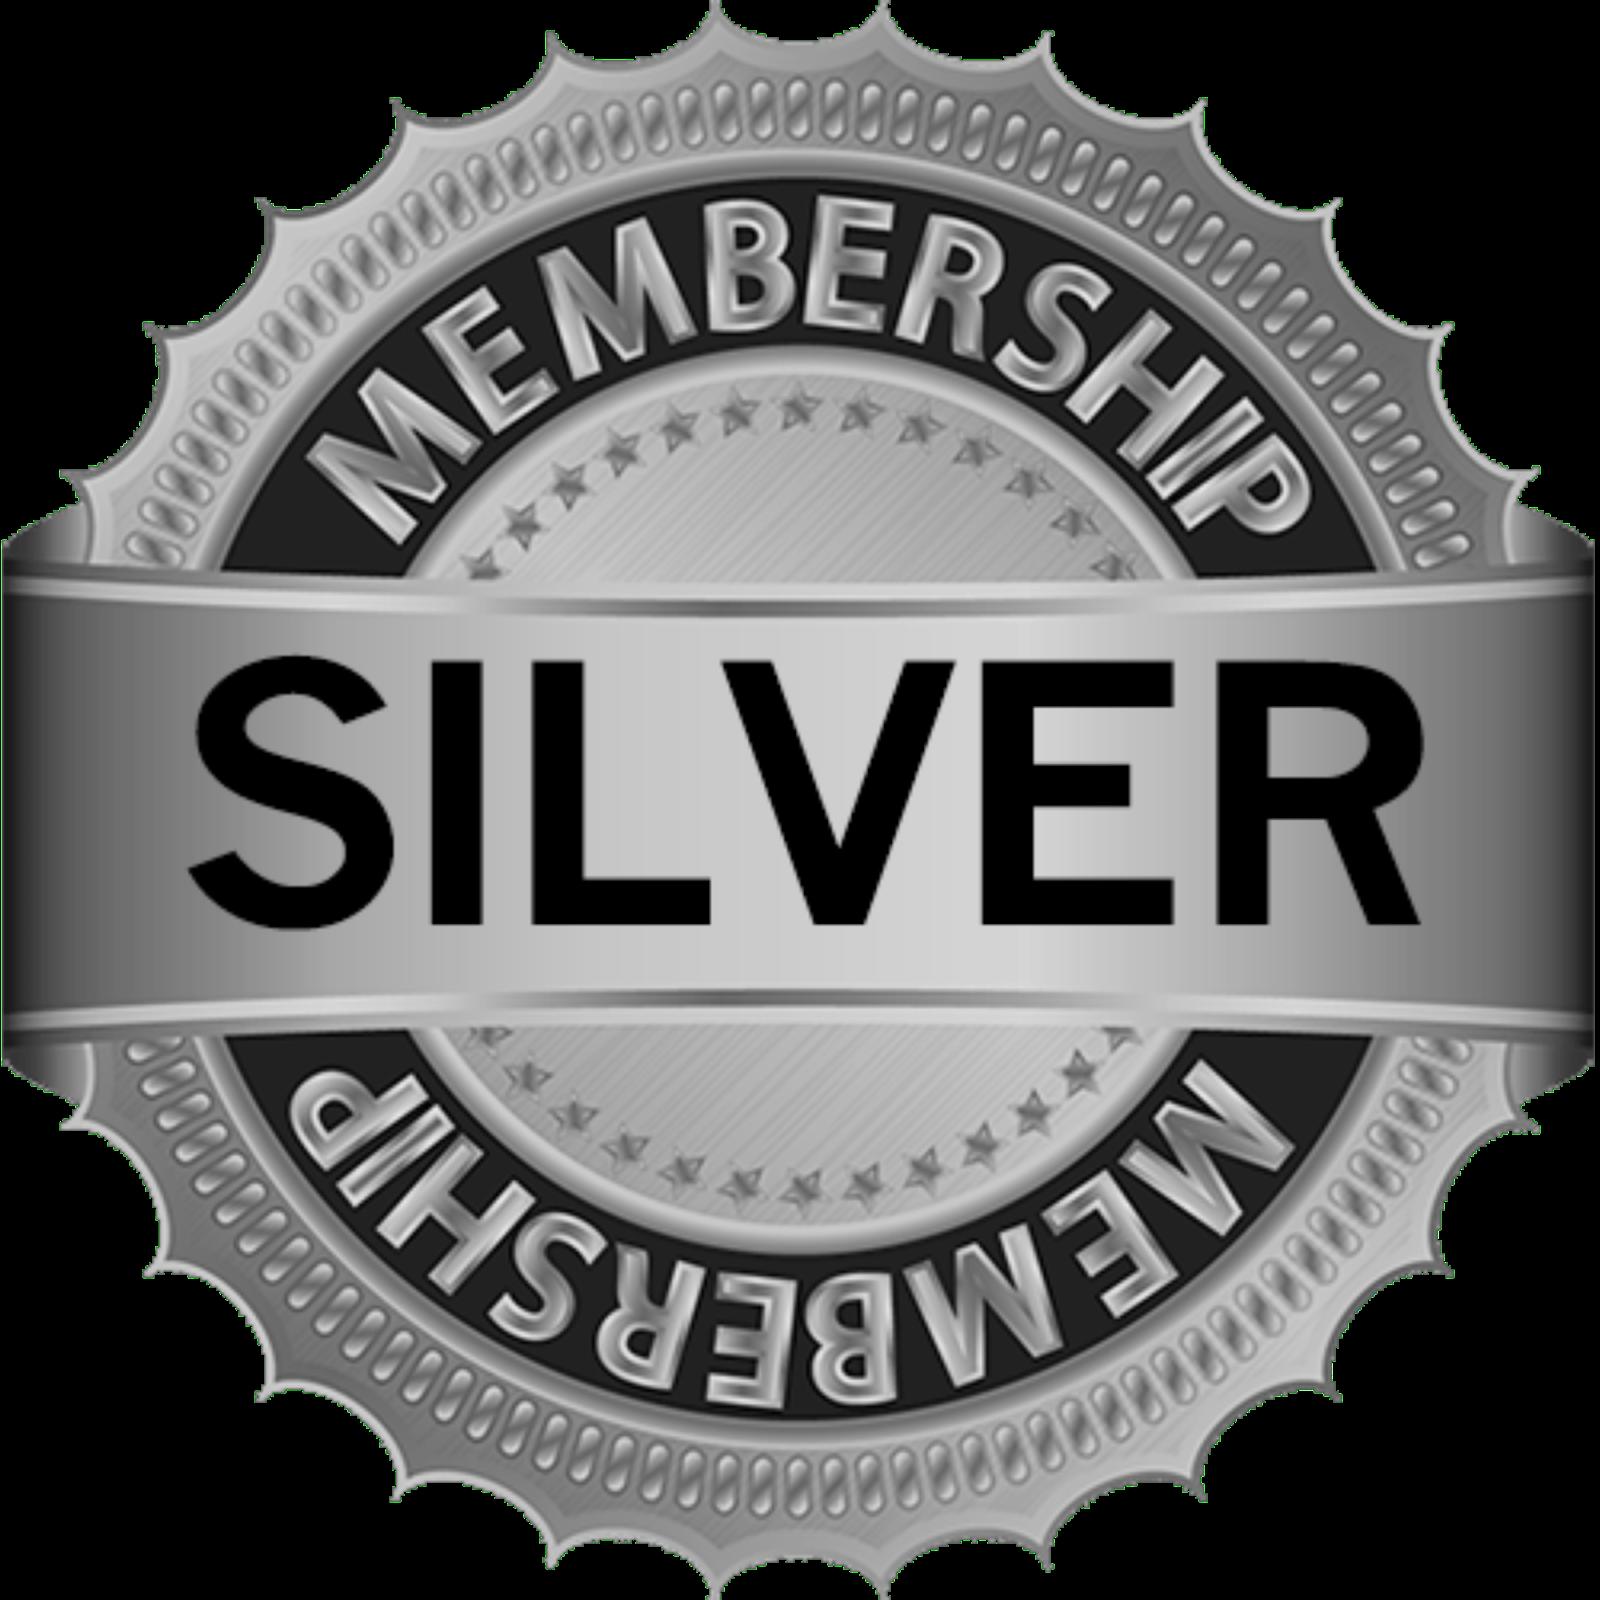 Peluang Bisnis Minicon Indonesia Japan Technology Voucher Rp2500000 Paket Silver Promo Spesial